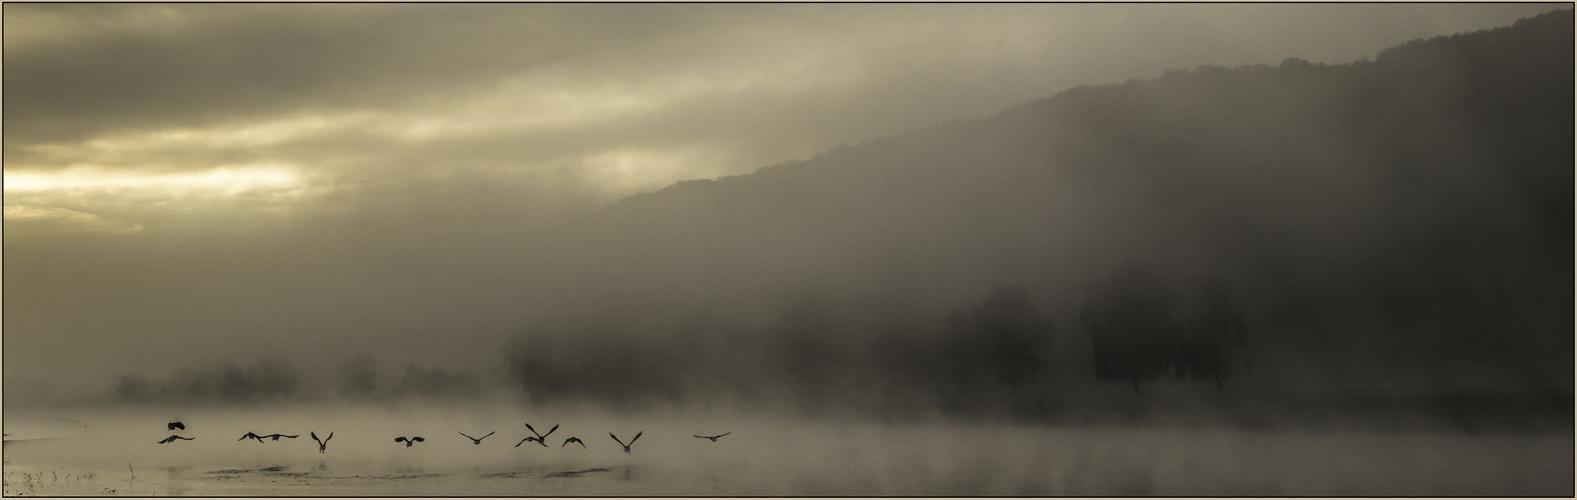 Nebel über denm Fluß